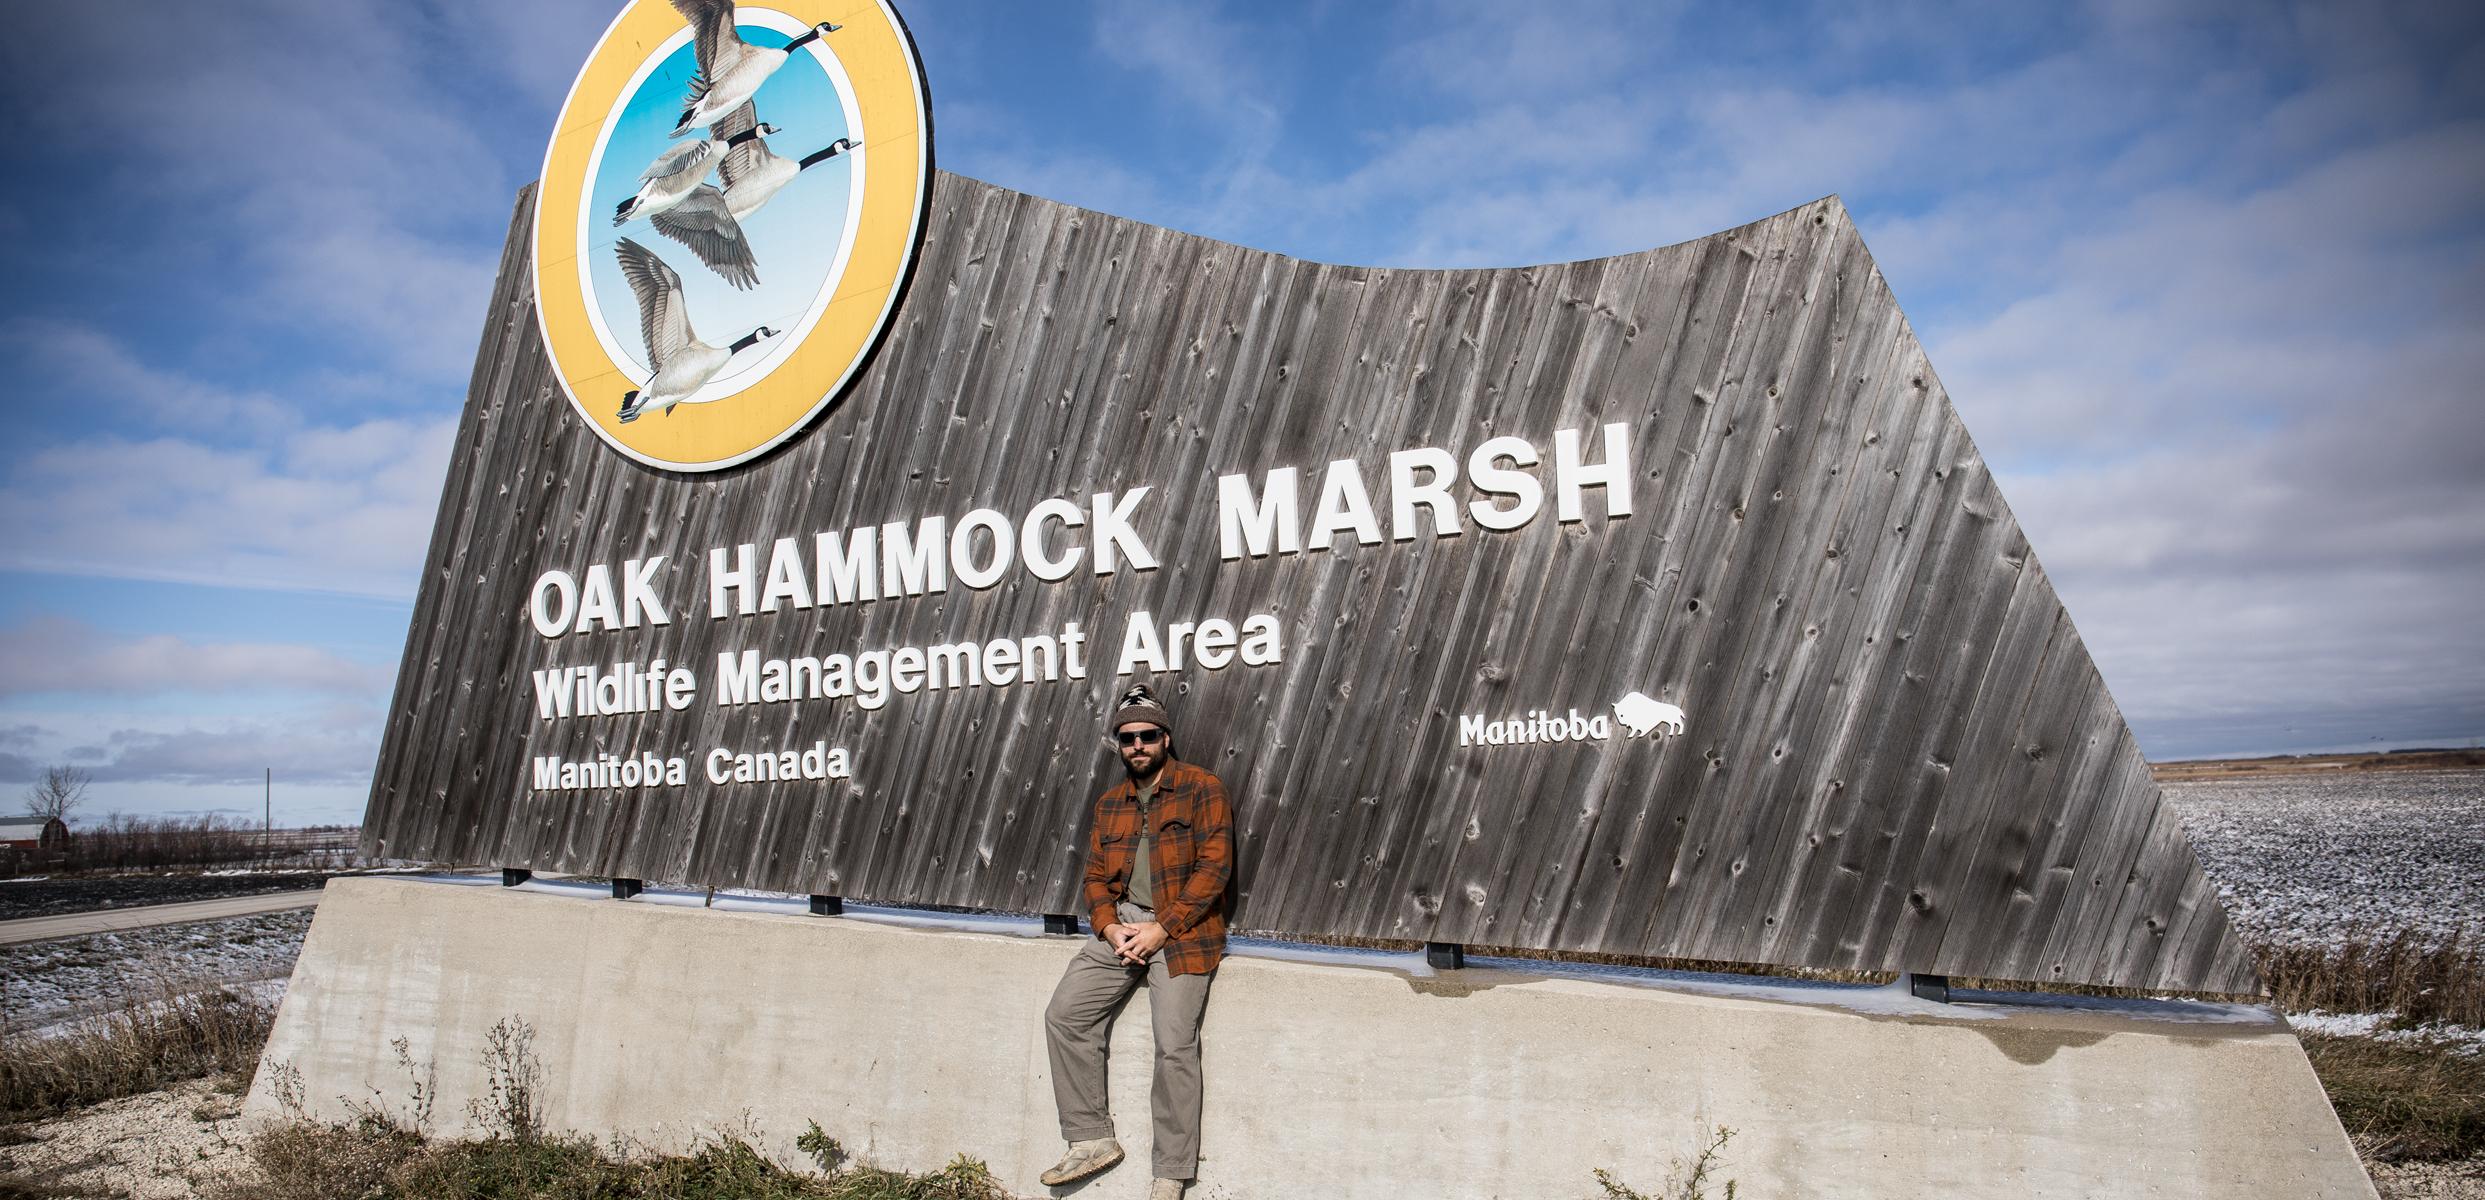 Oak Hammock Photo 4.jpg